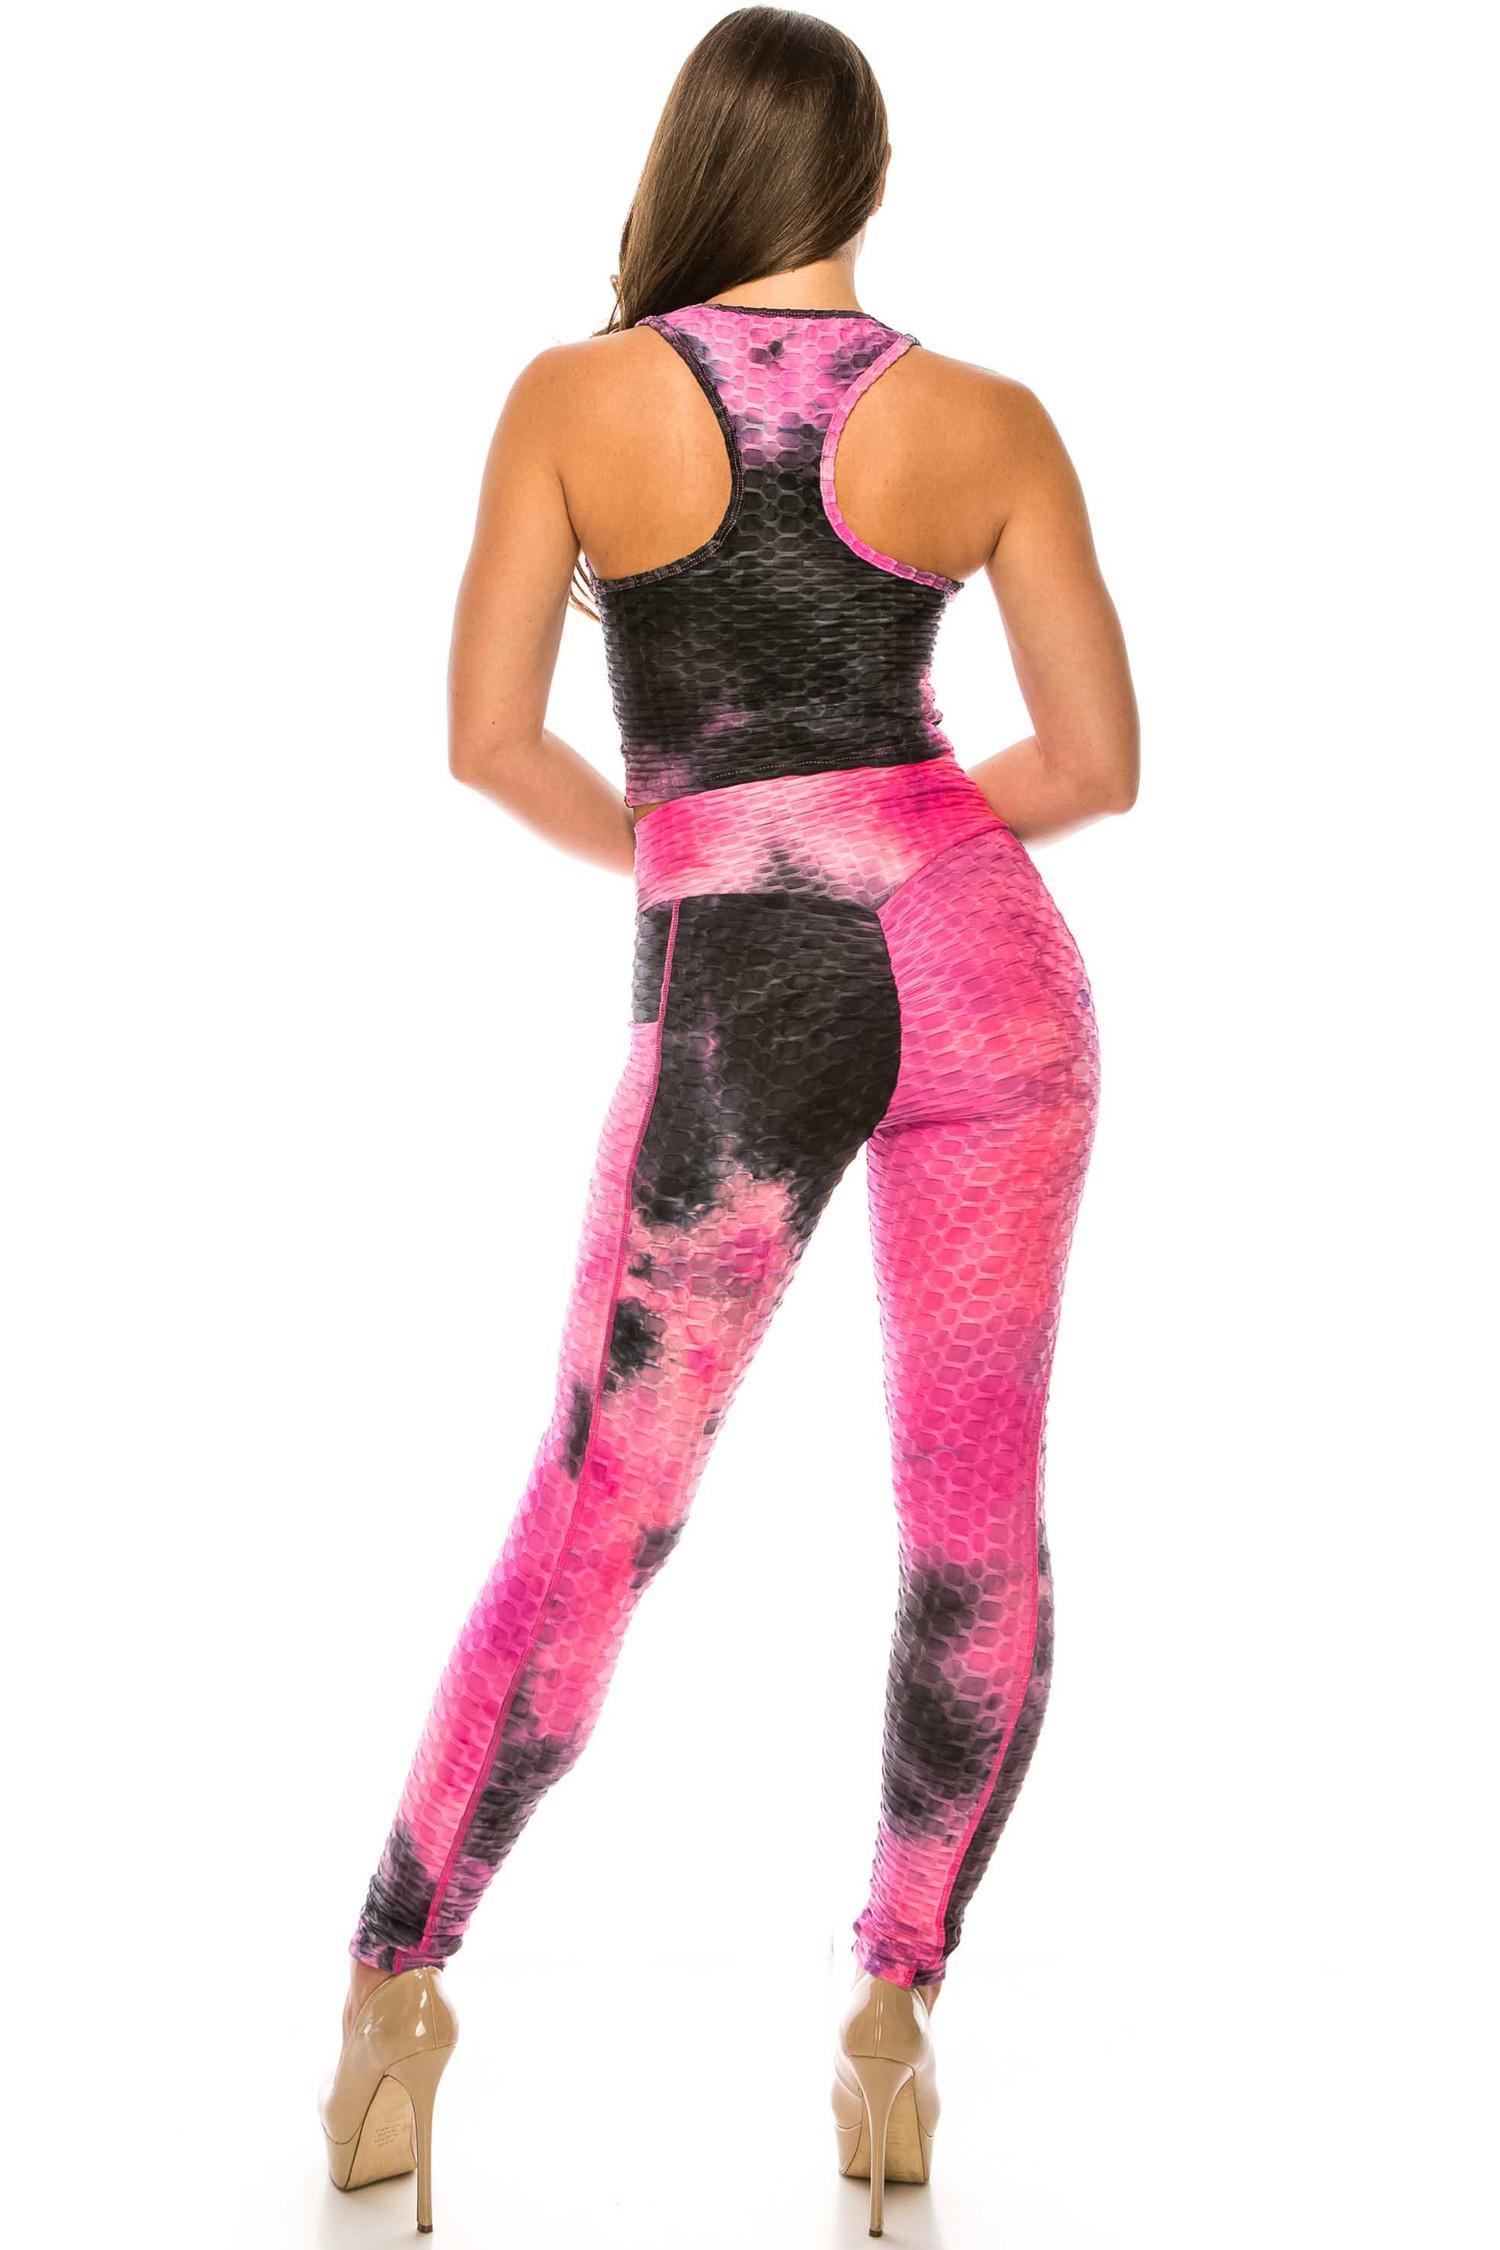 2 Piece Scrunch Butt Sport Leggings and Crop Top Set with Pockets